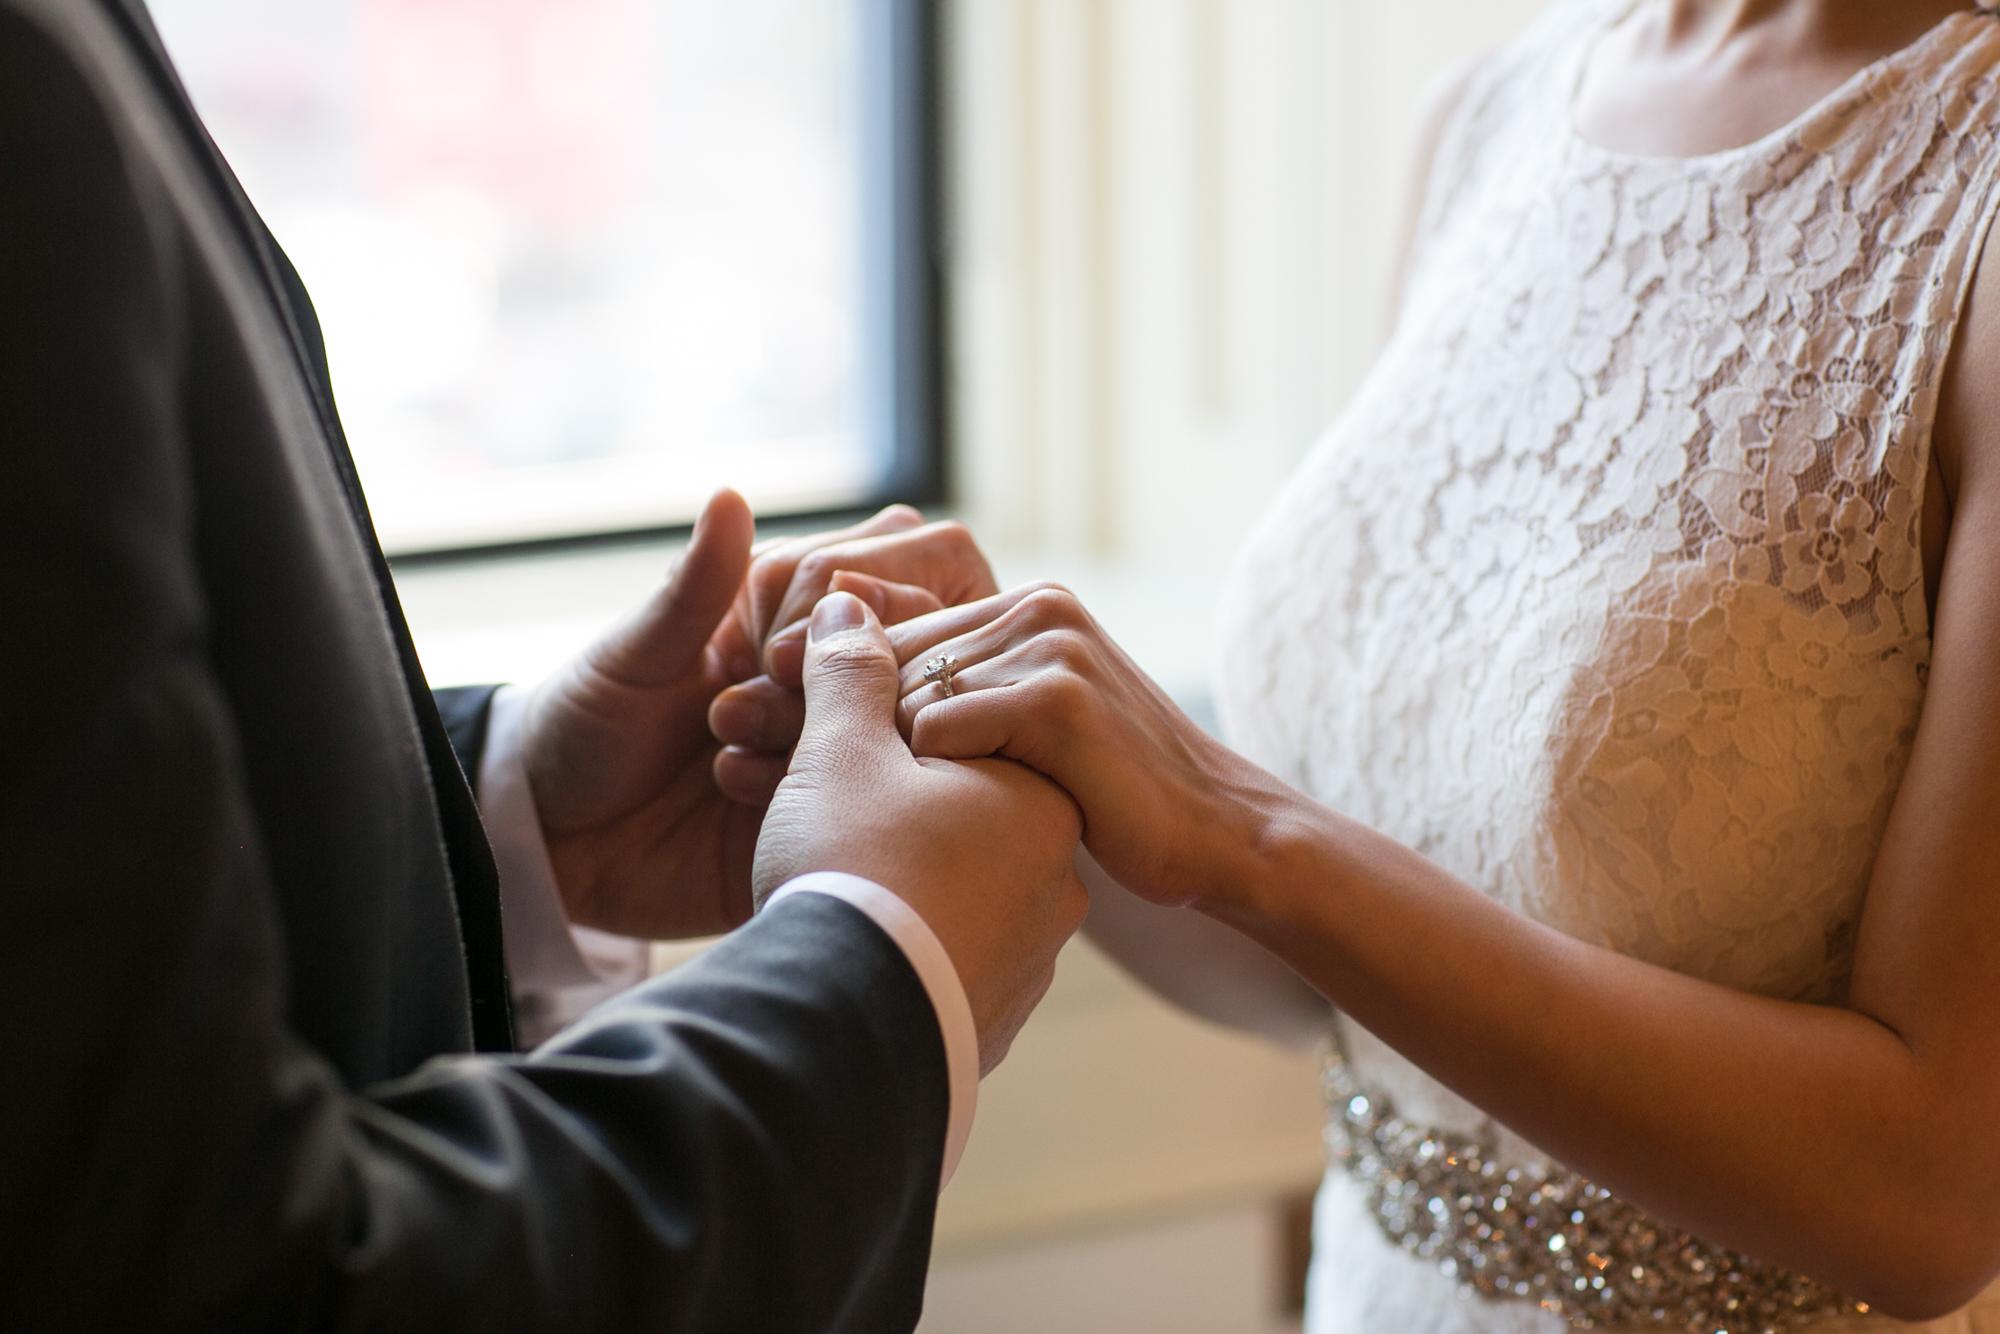 vancouver-luxury-wedding-photographer-lori-miles--6.jpg